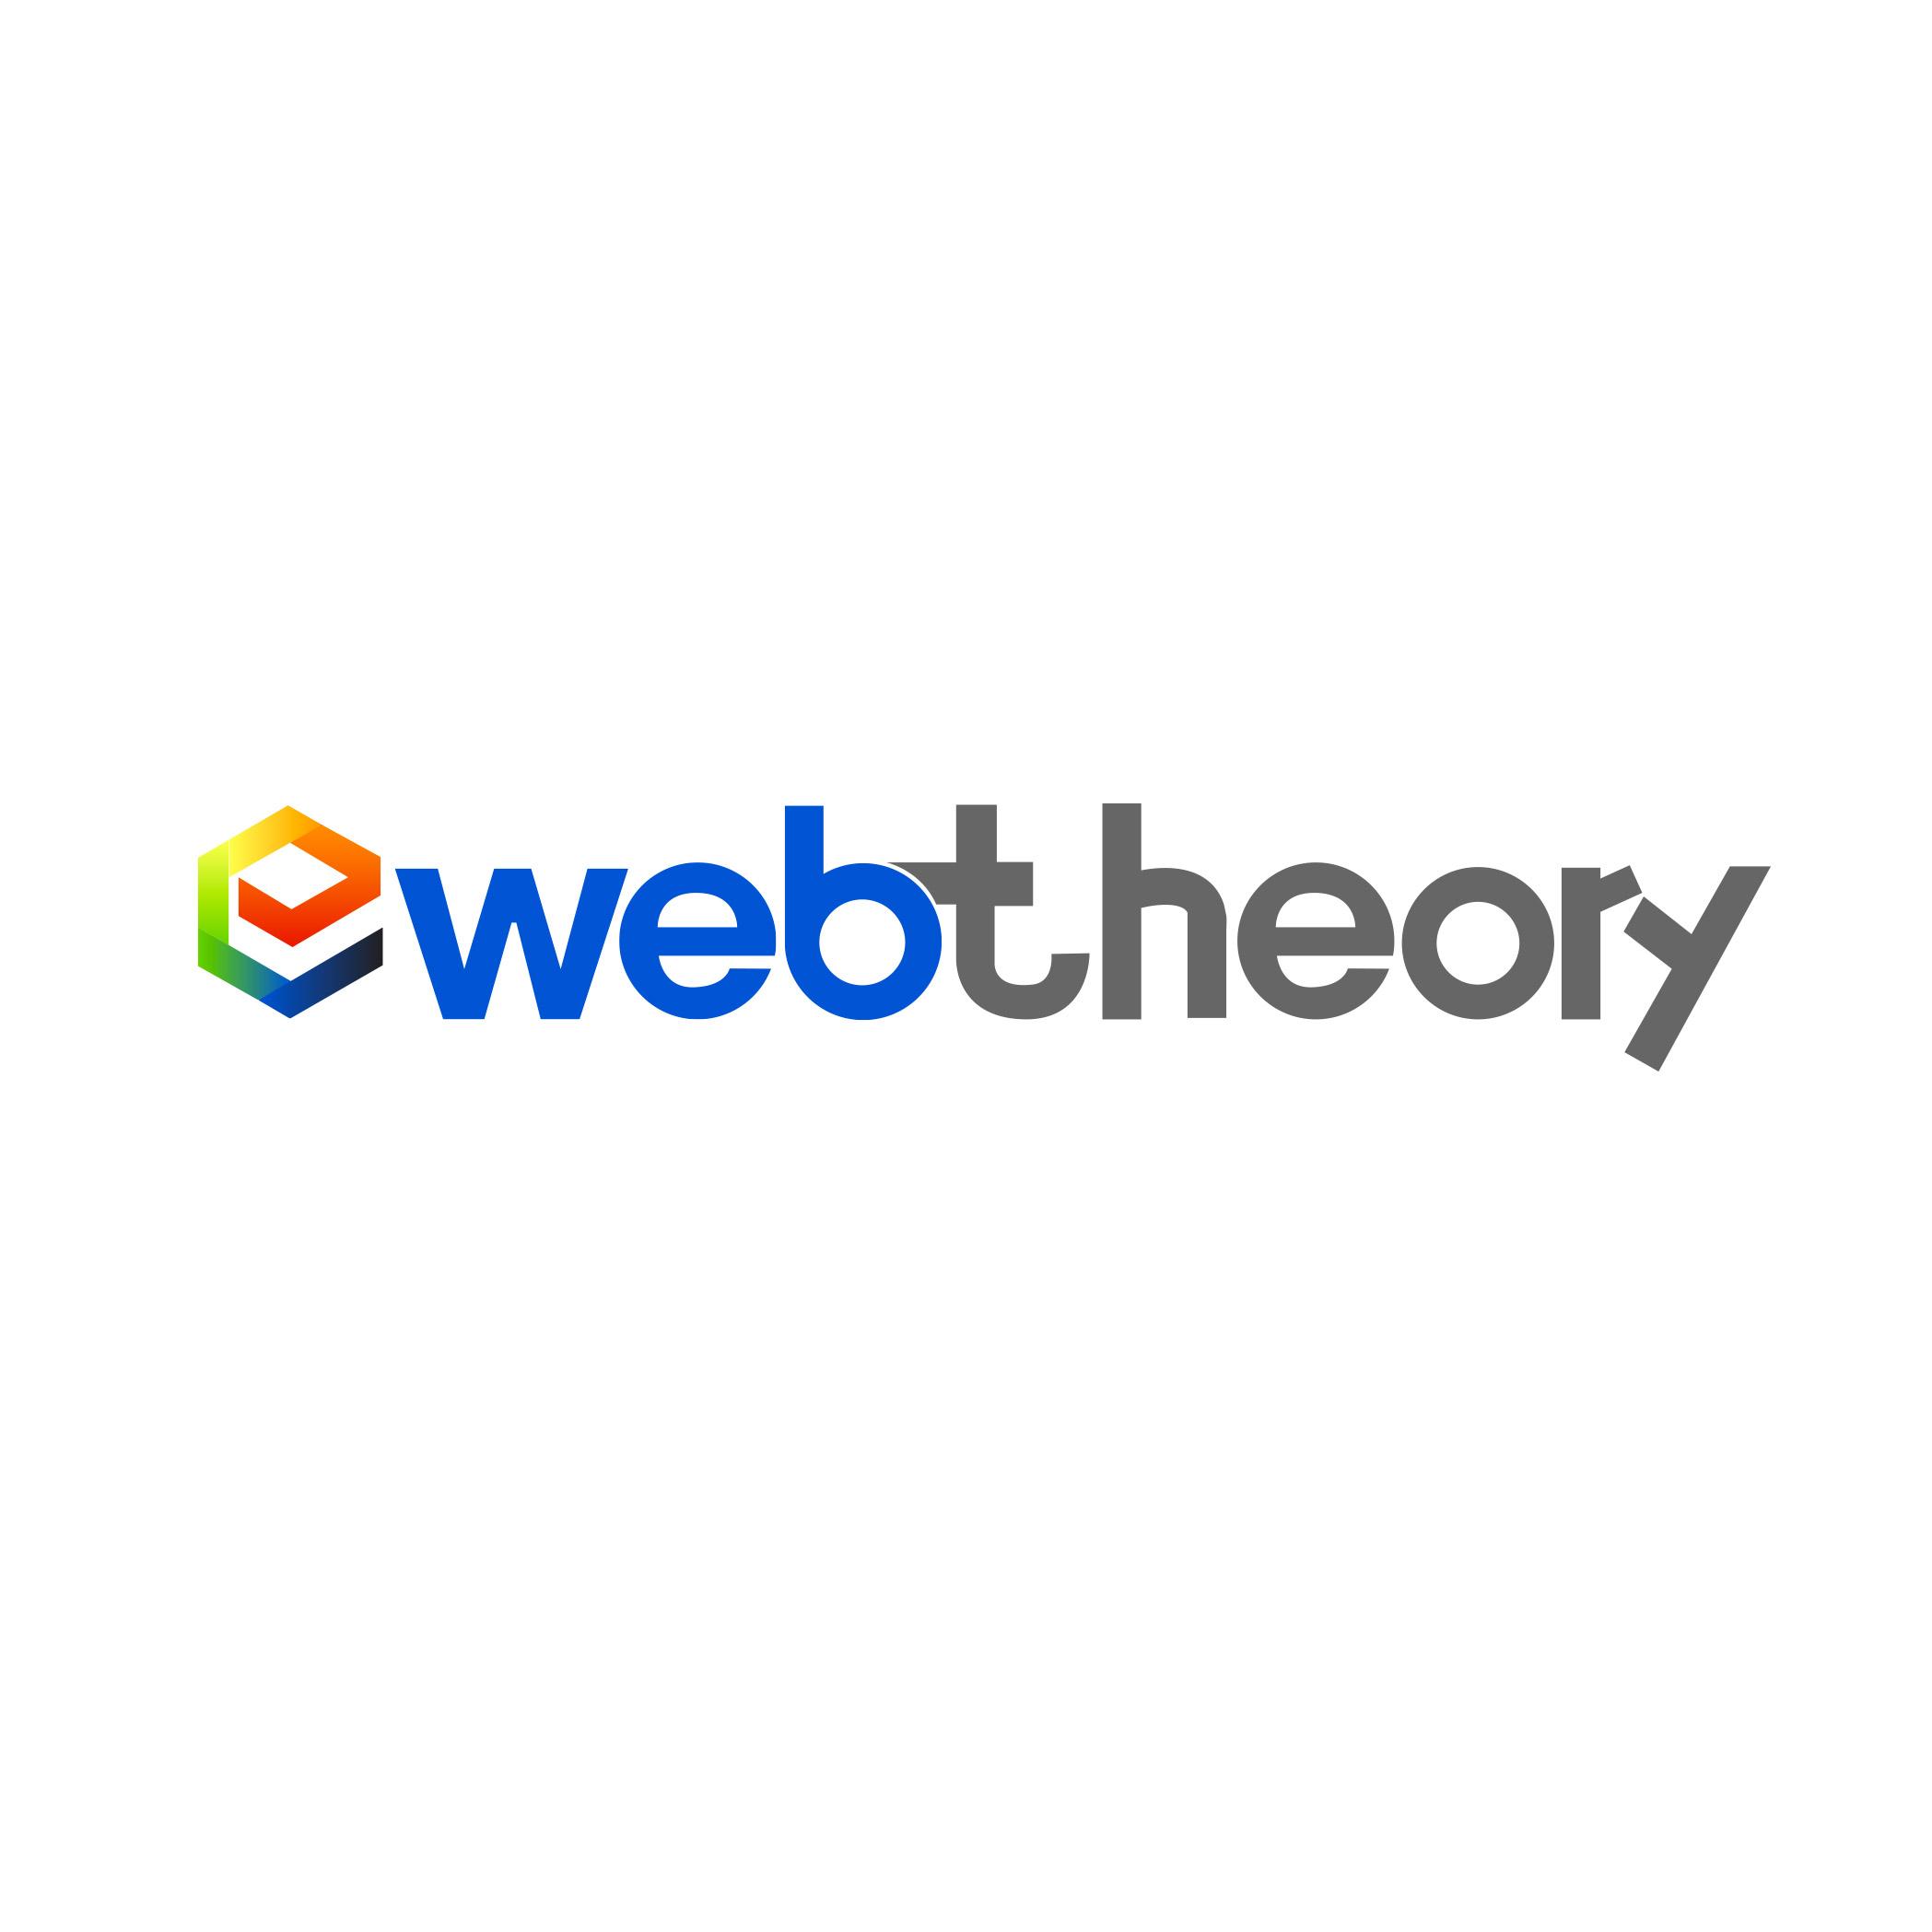 Logo Webtheory - Web Acency